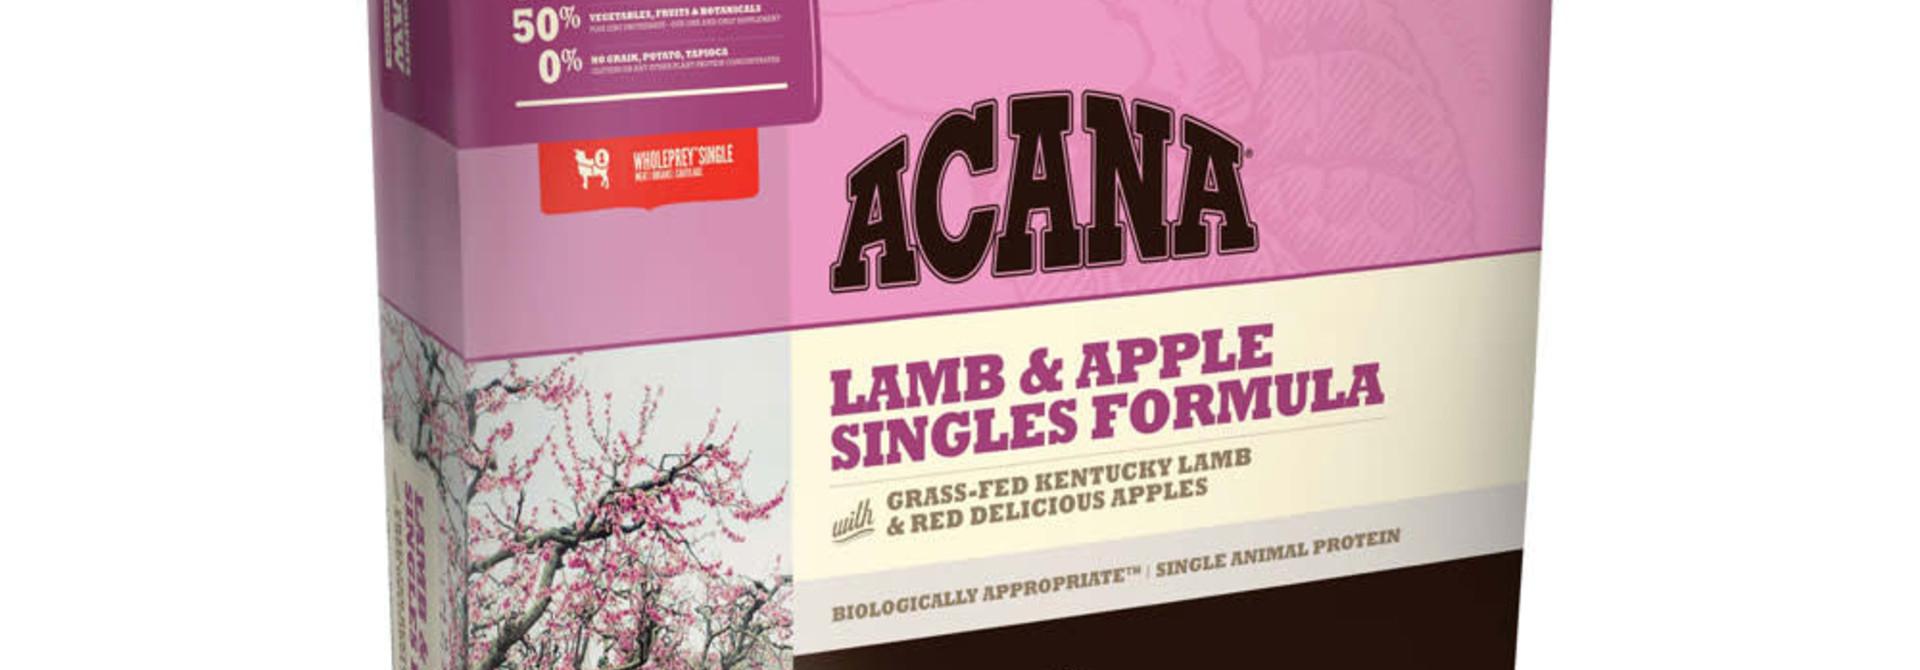 ACS Lamb & Apple